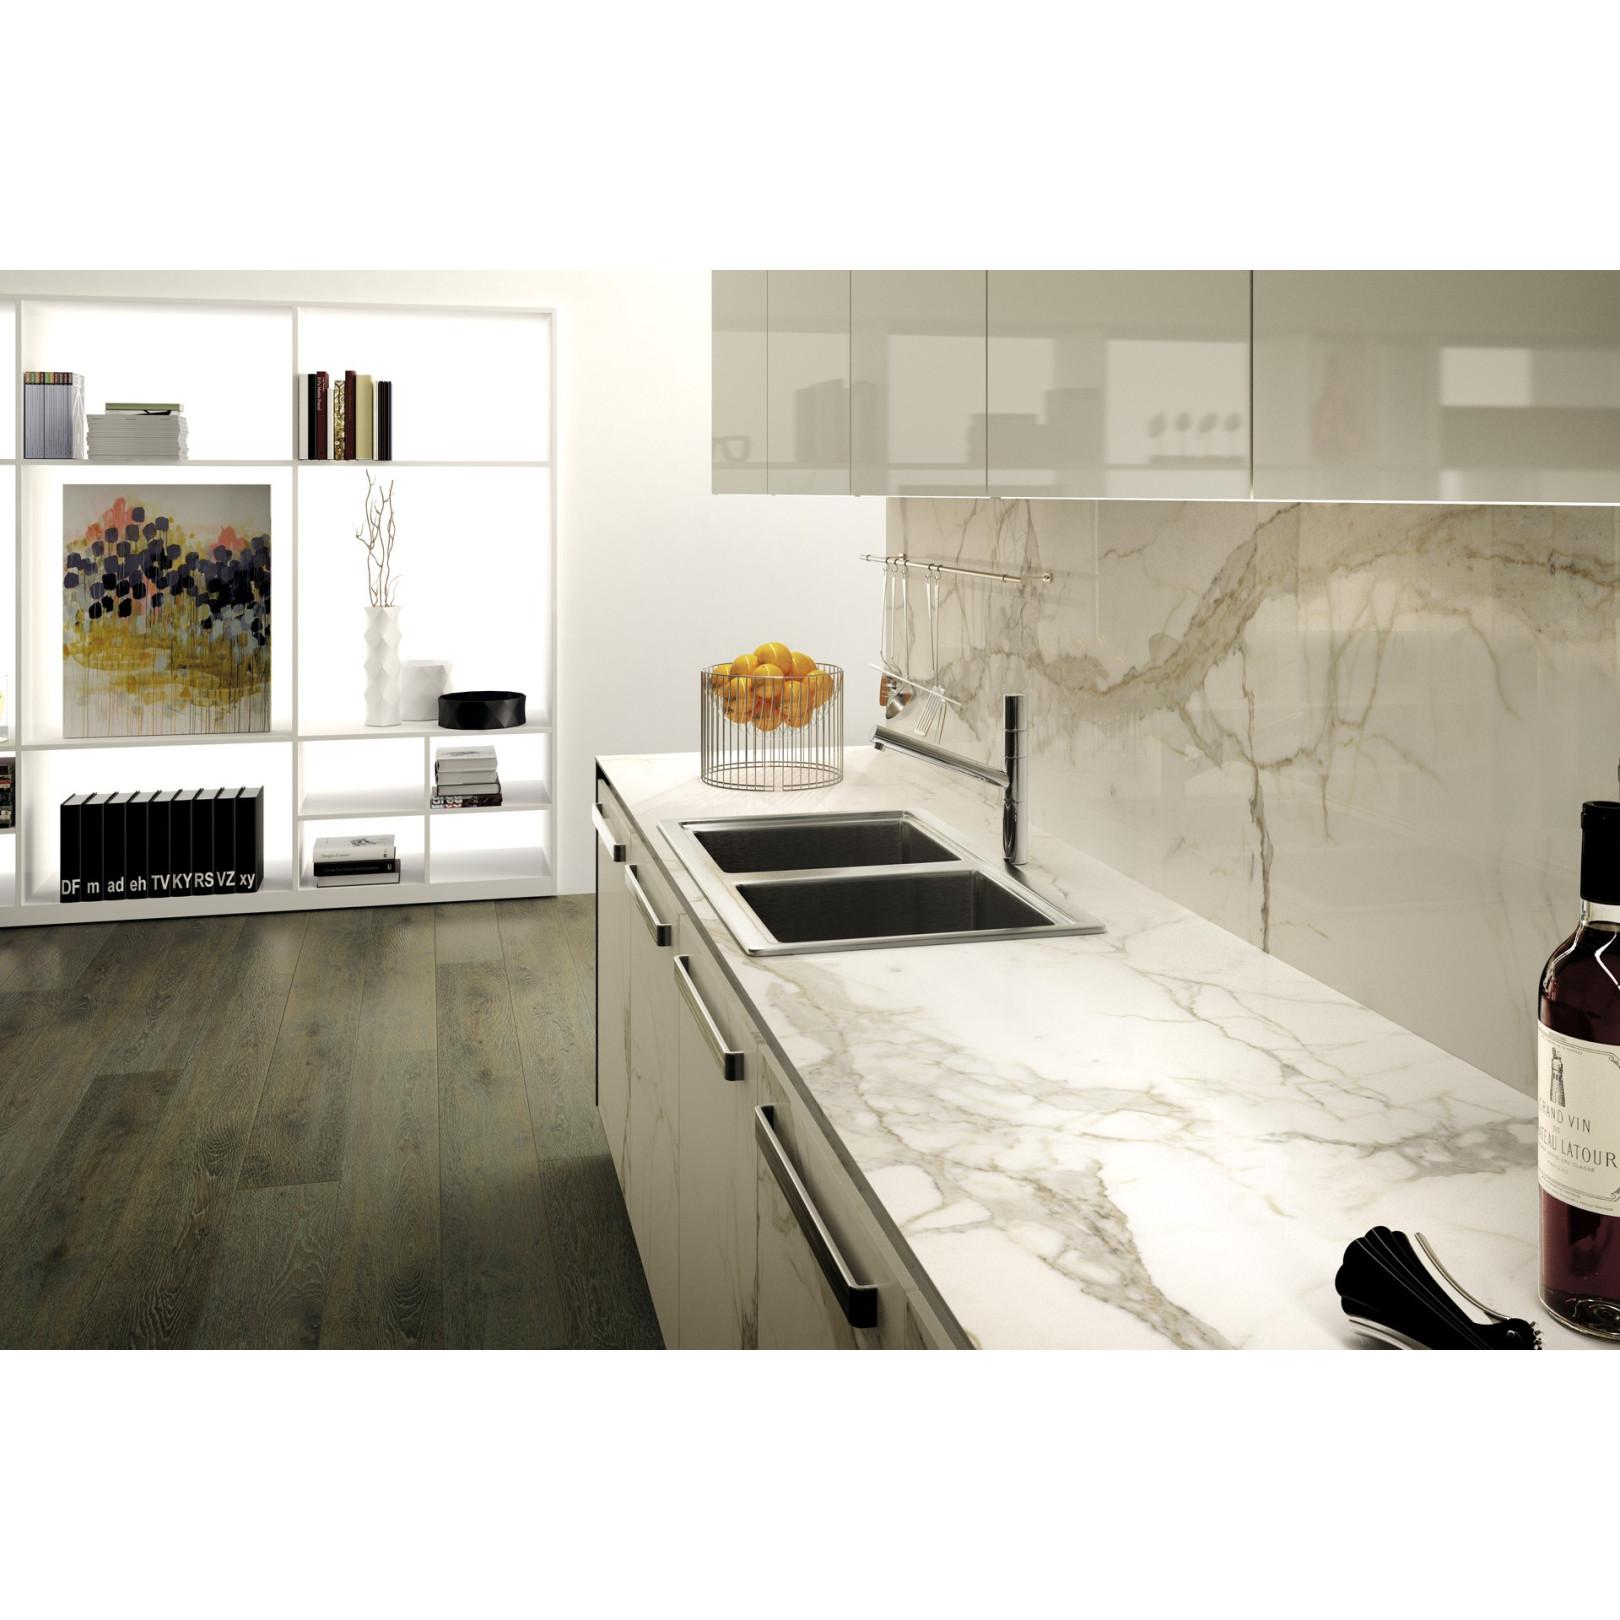 carrelage gr s c rame effet marbre mf calacatta rectifi casalux home design. Black Bedroom Furniture Sets. Home Design Ideas